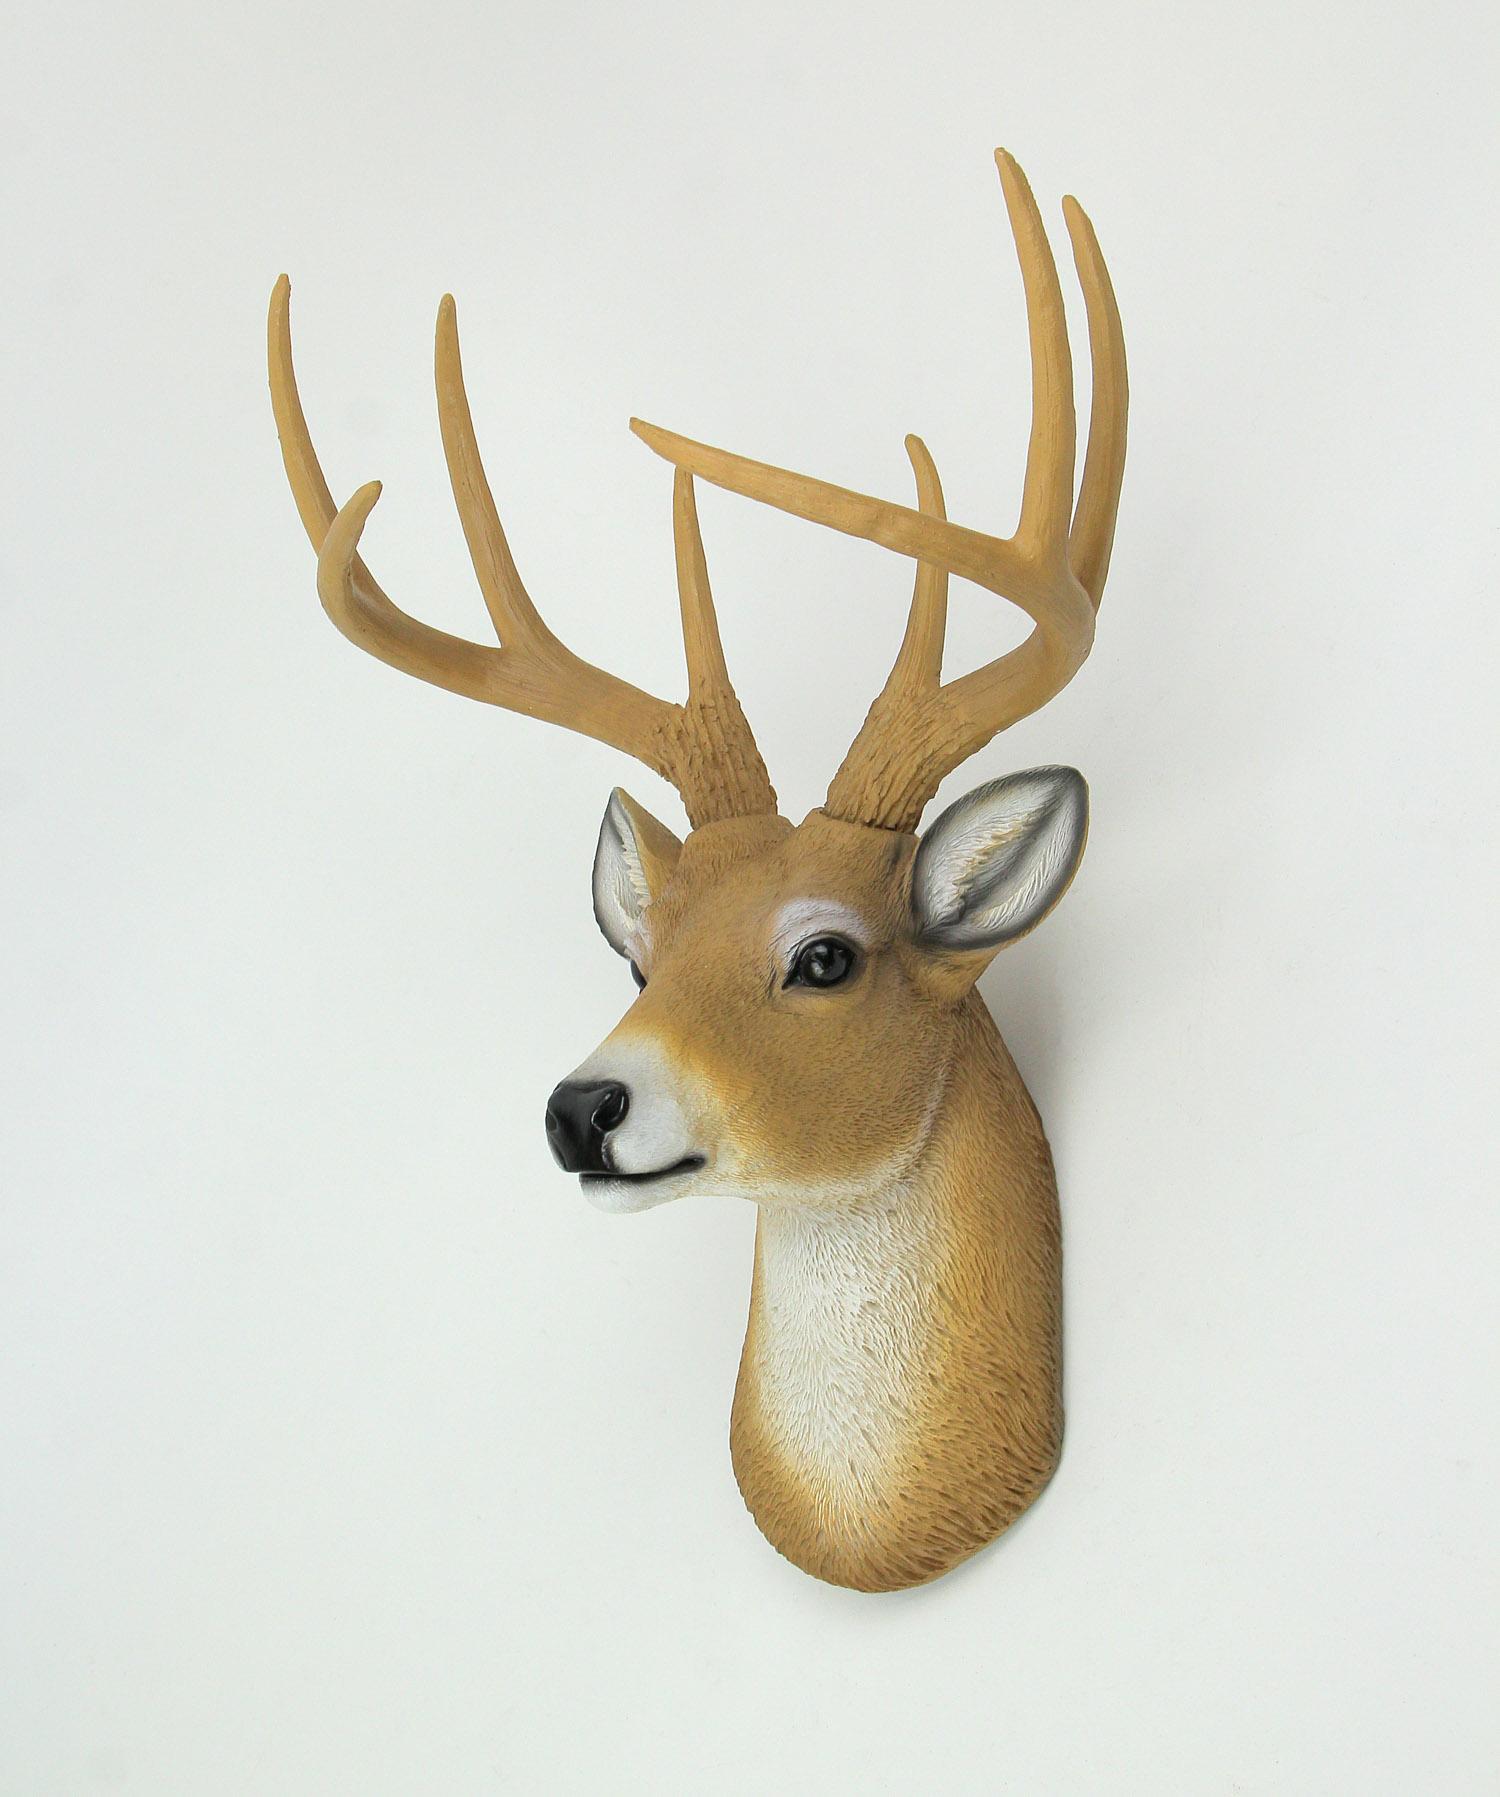 thumbnail 3 - Deer Head Buck Horns Wall Mounted Antler Trophy Faux Taxidermy Sculpture